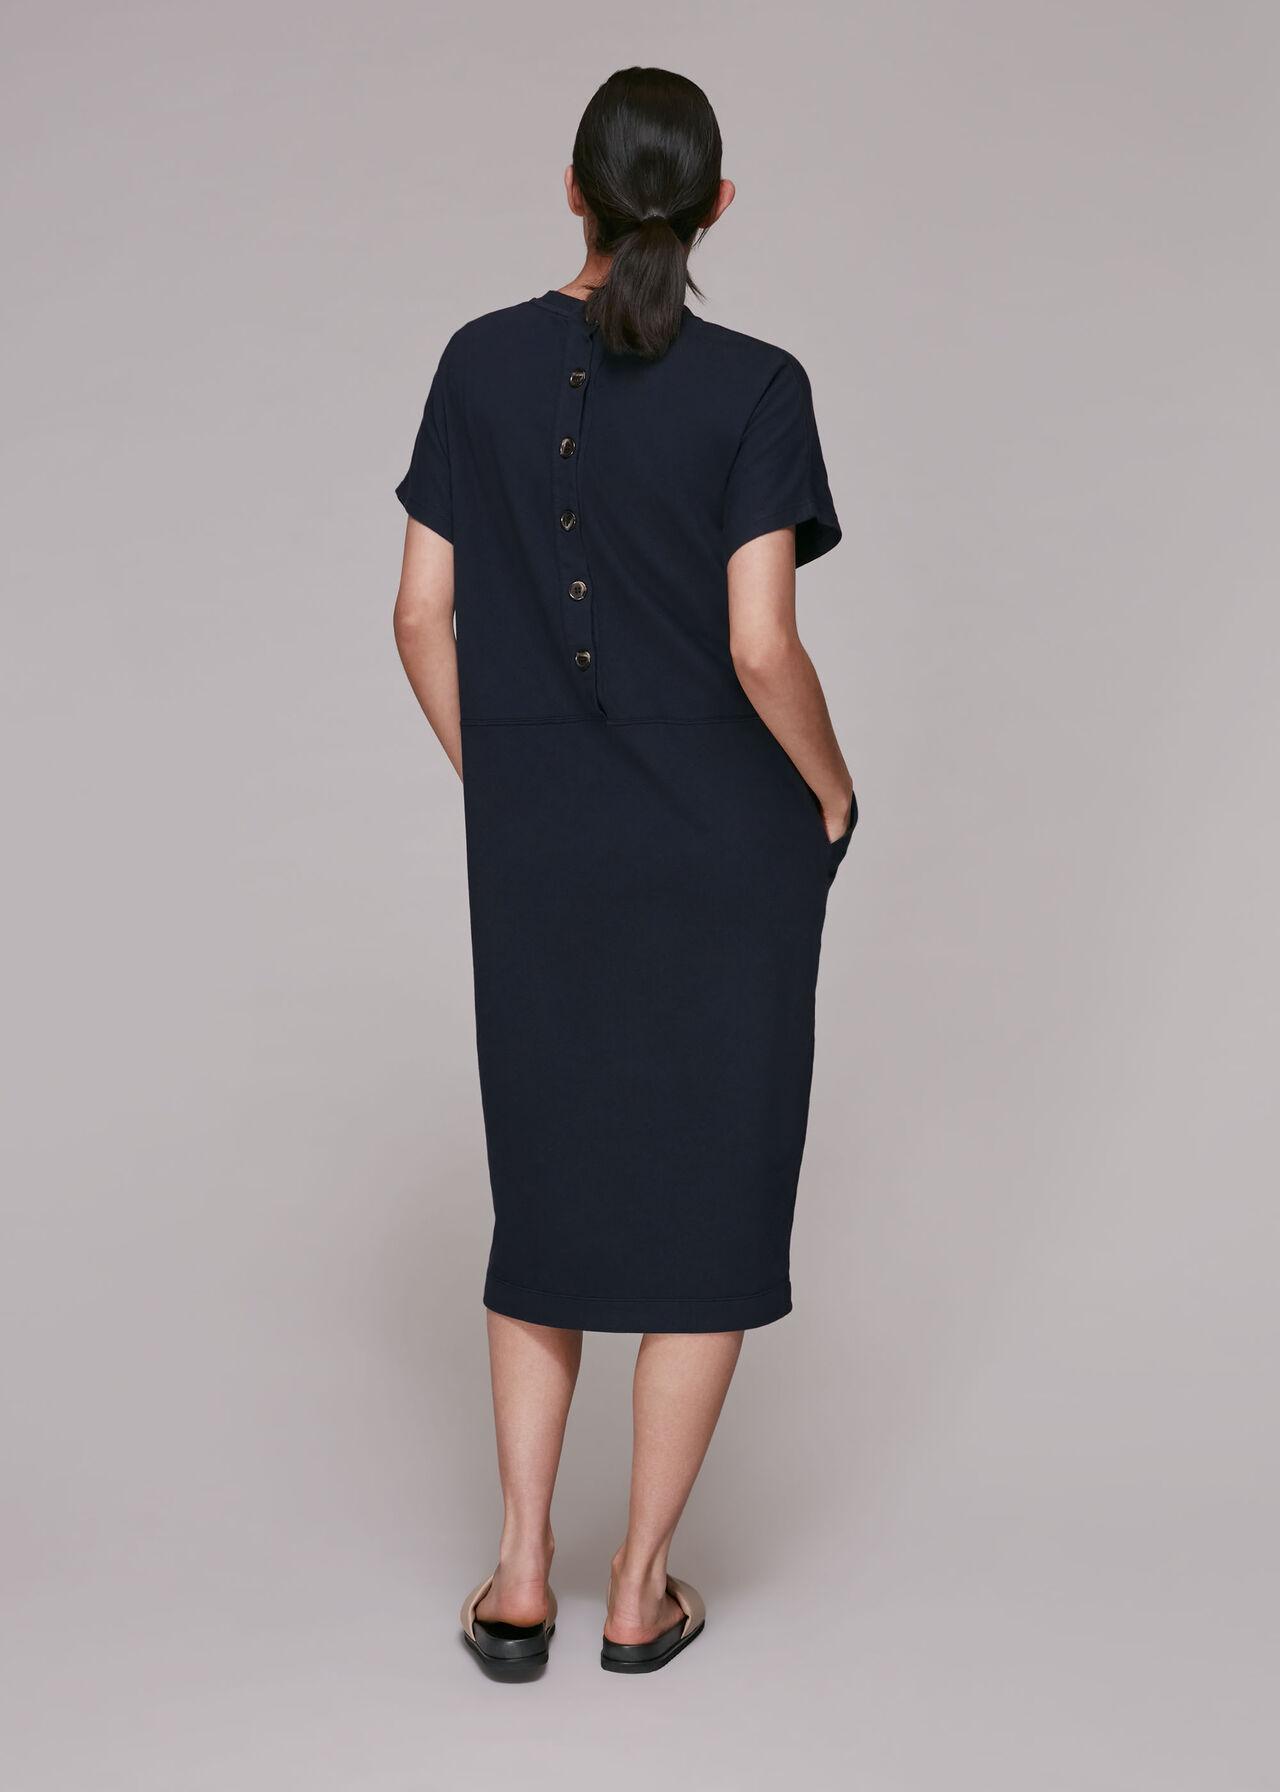 Elsie Button Back Jersey Dress